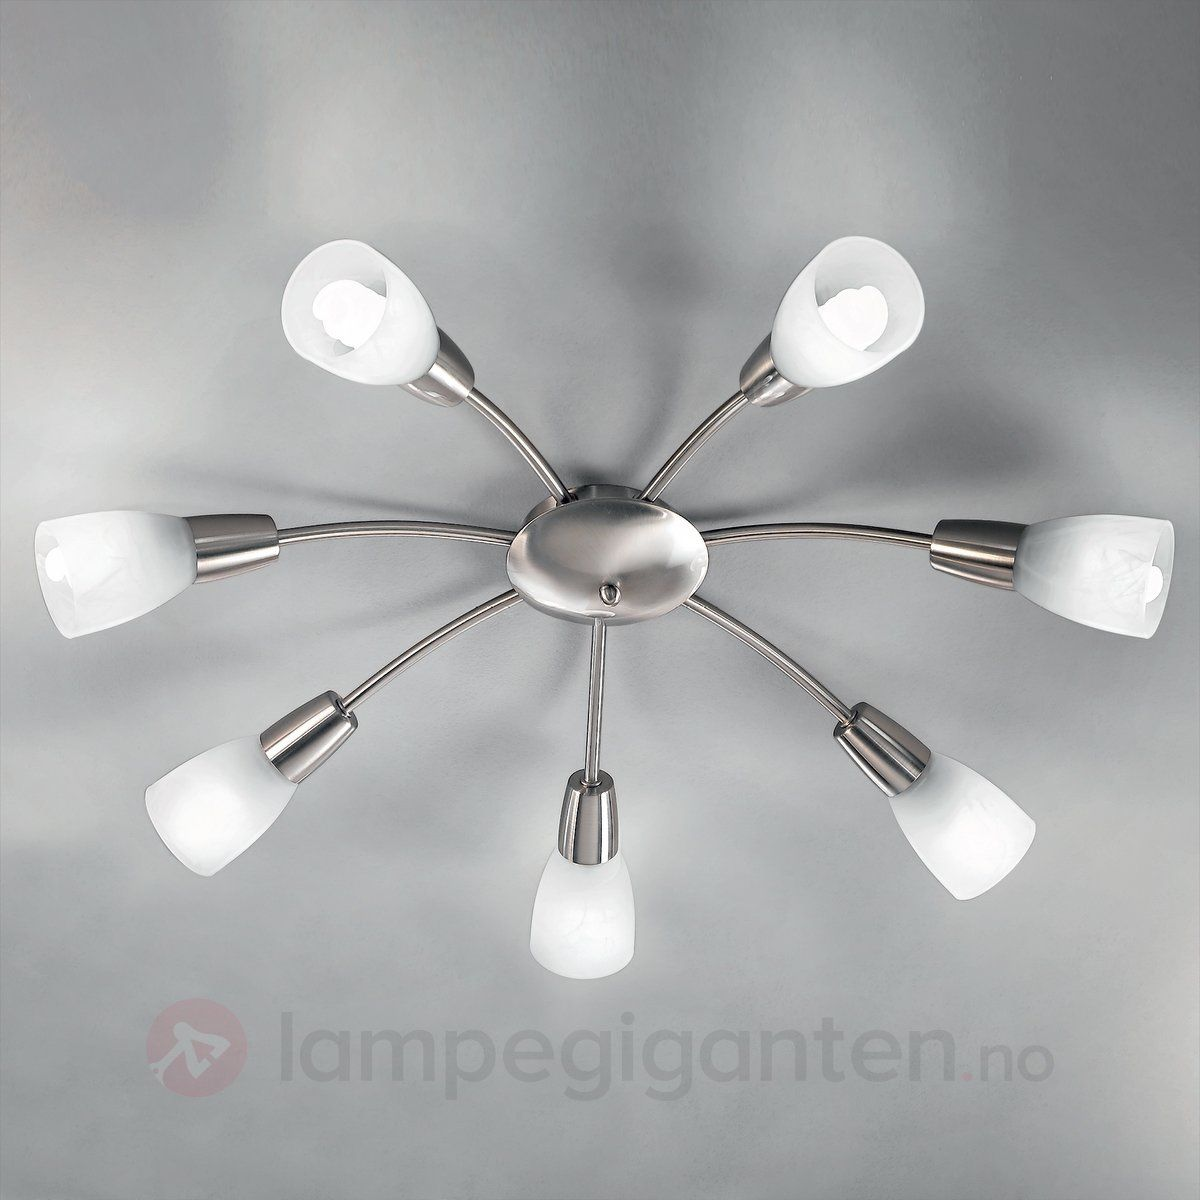 Lorena sølv